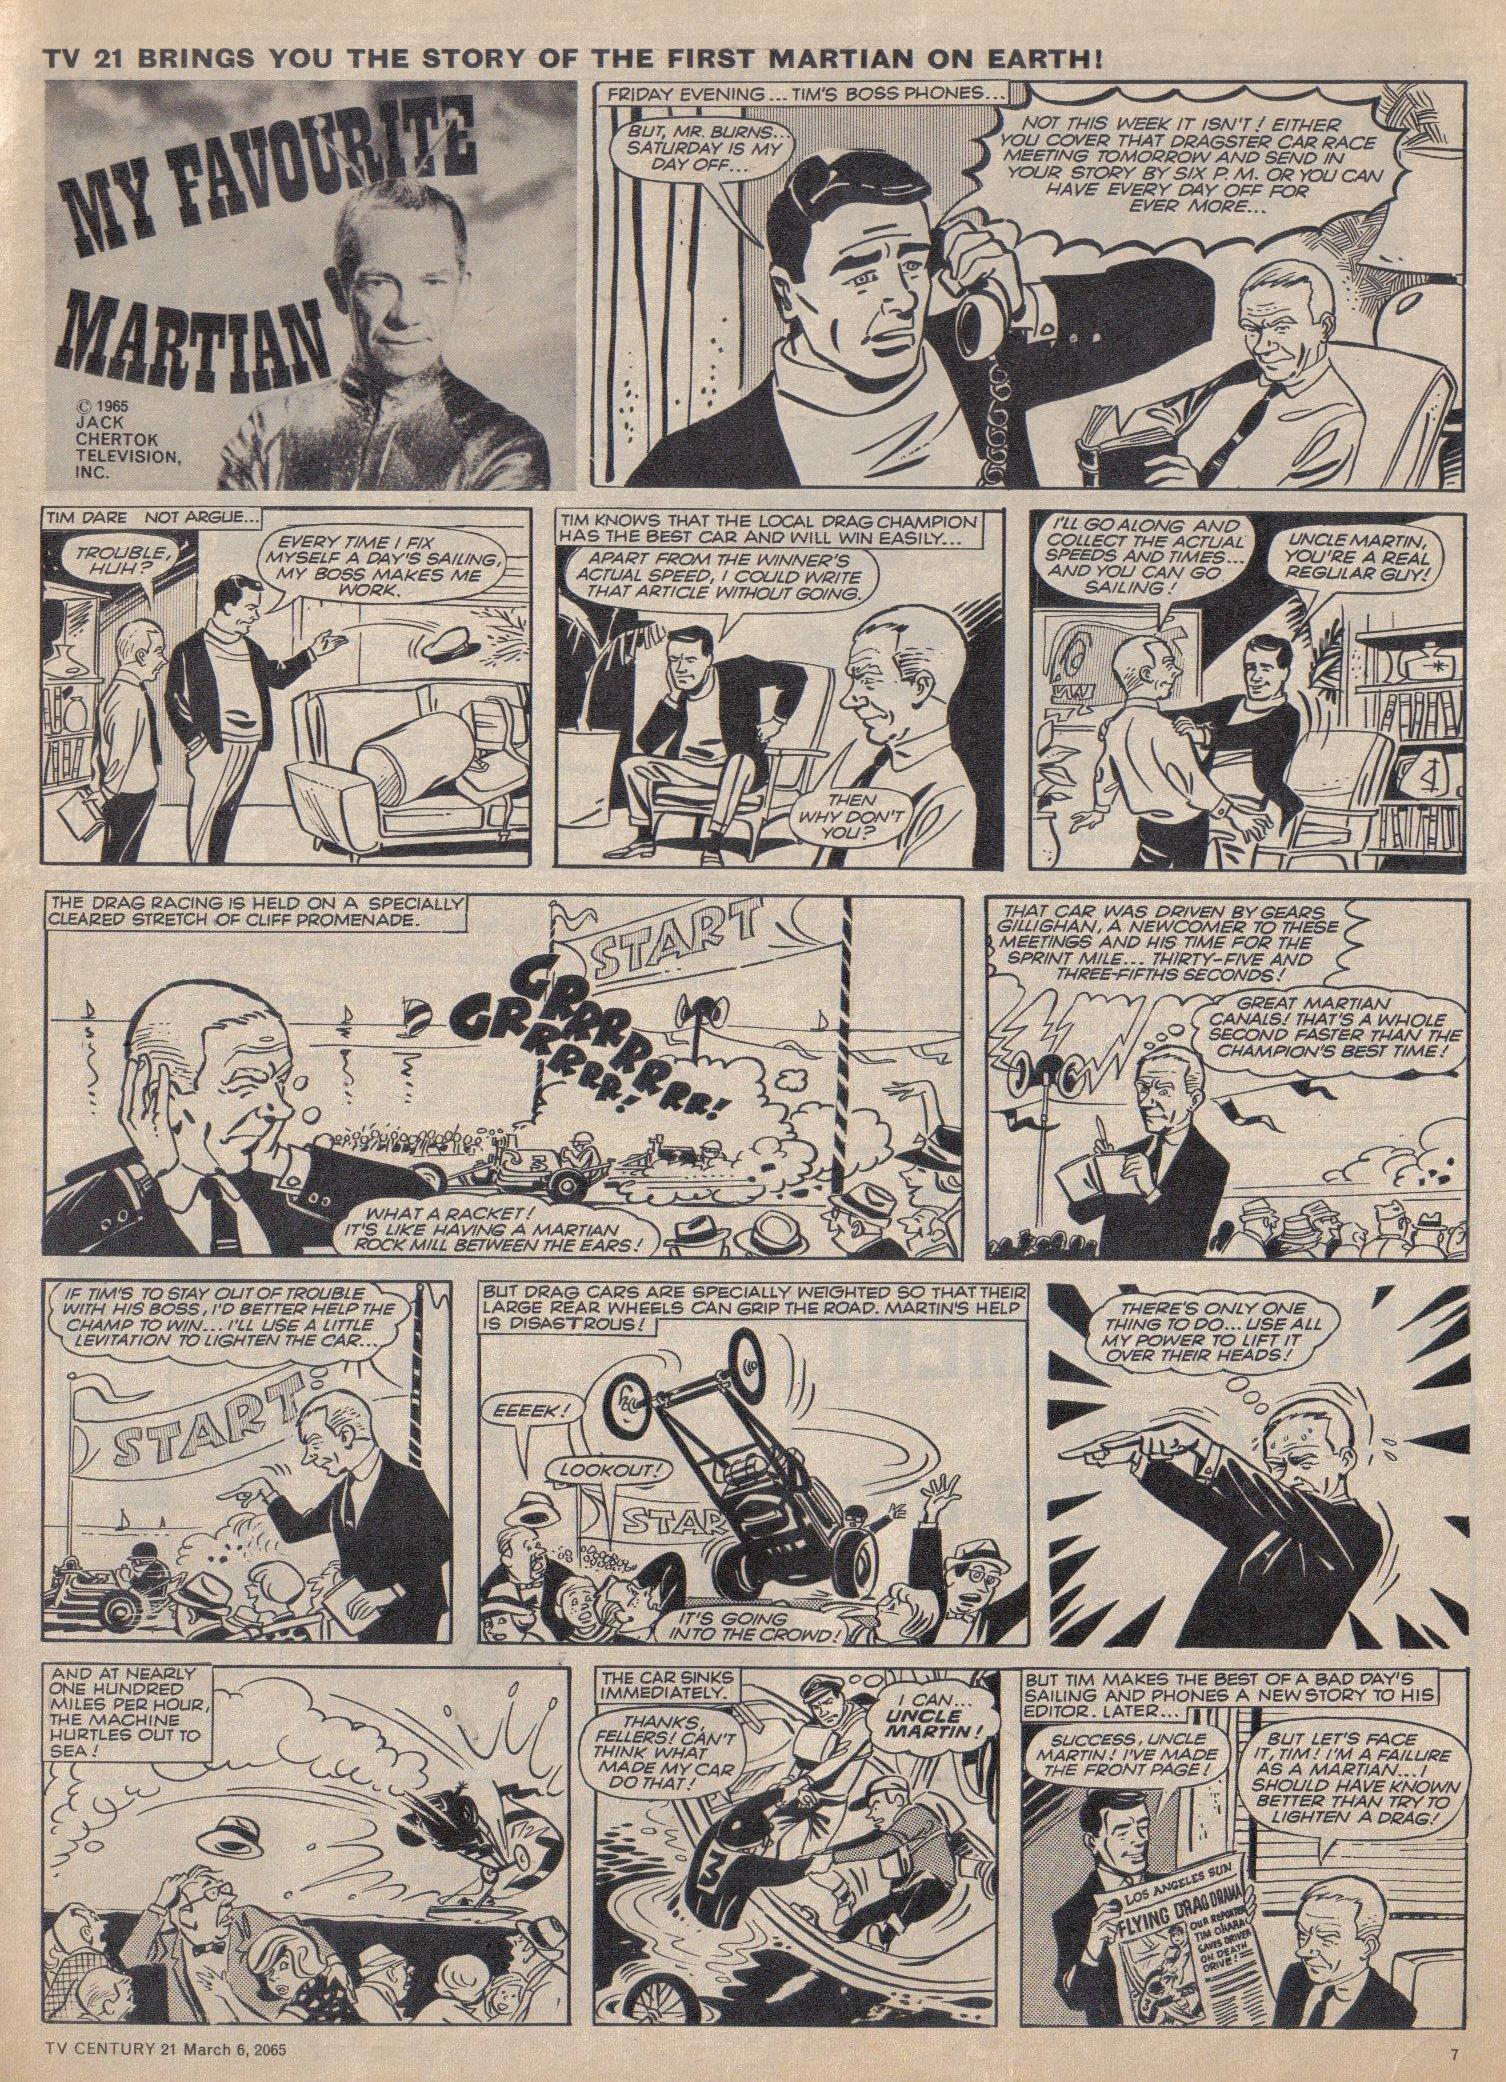 Read online TV Century 21 (TV 21) comic -  Issue #7 - 7